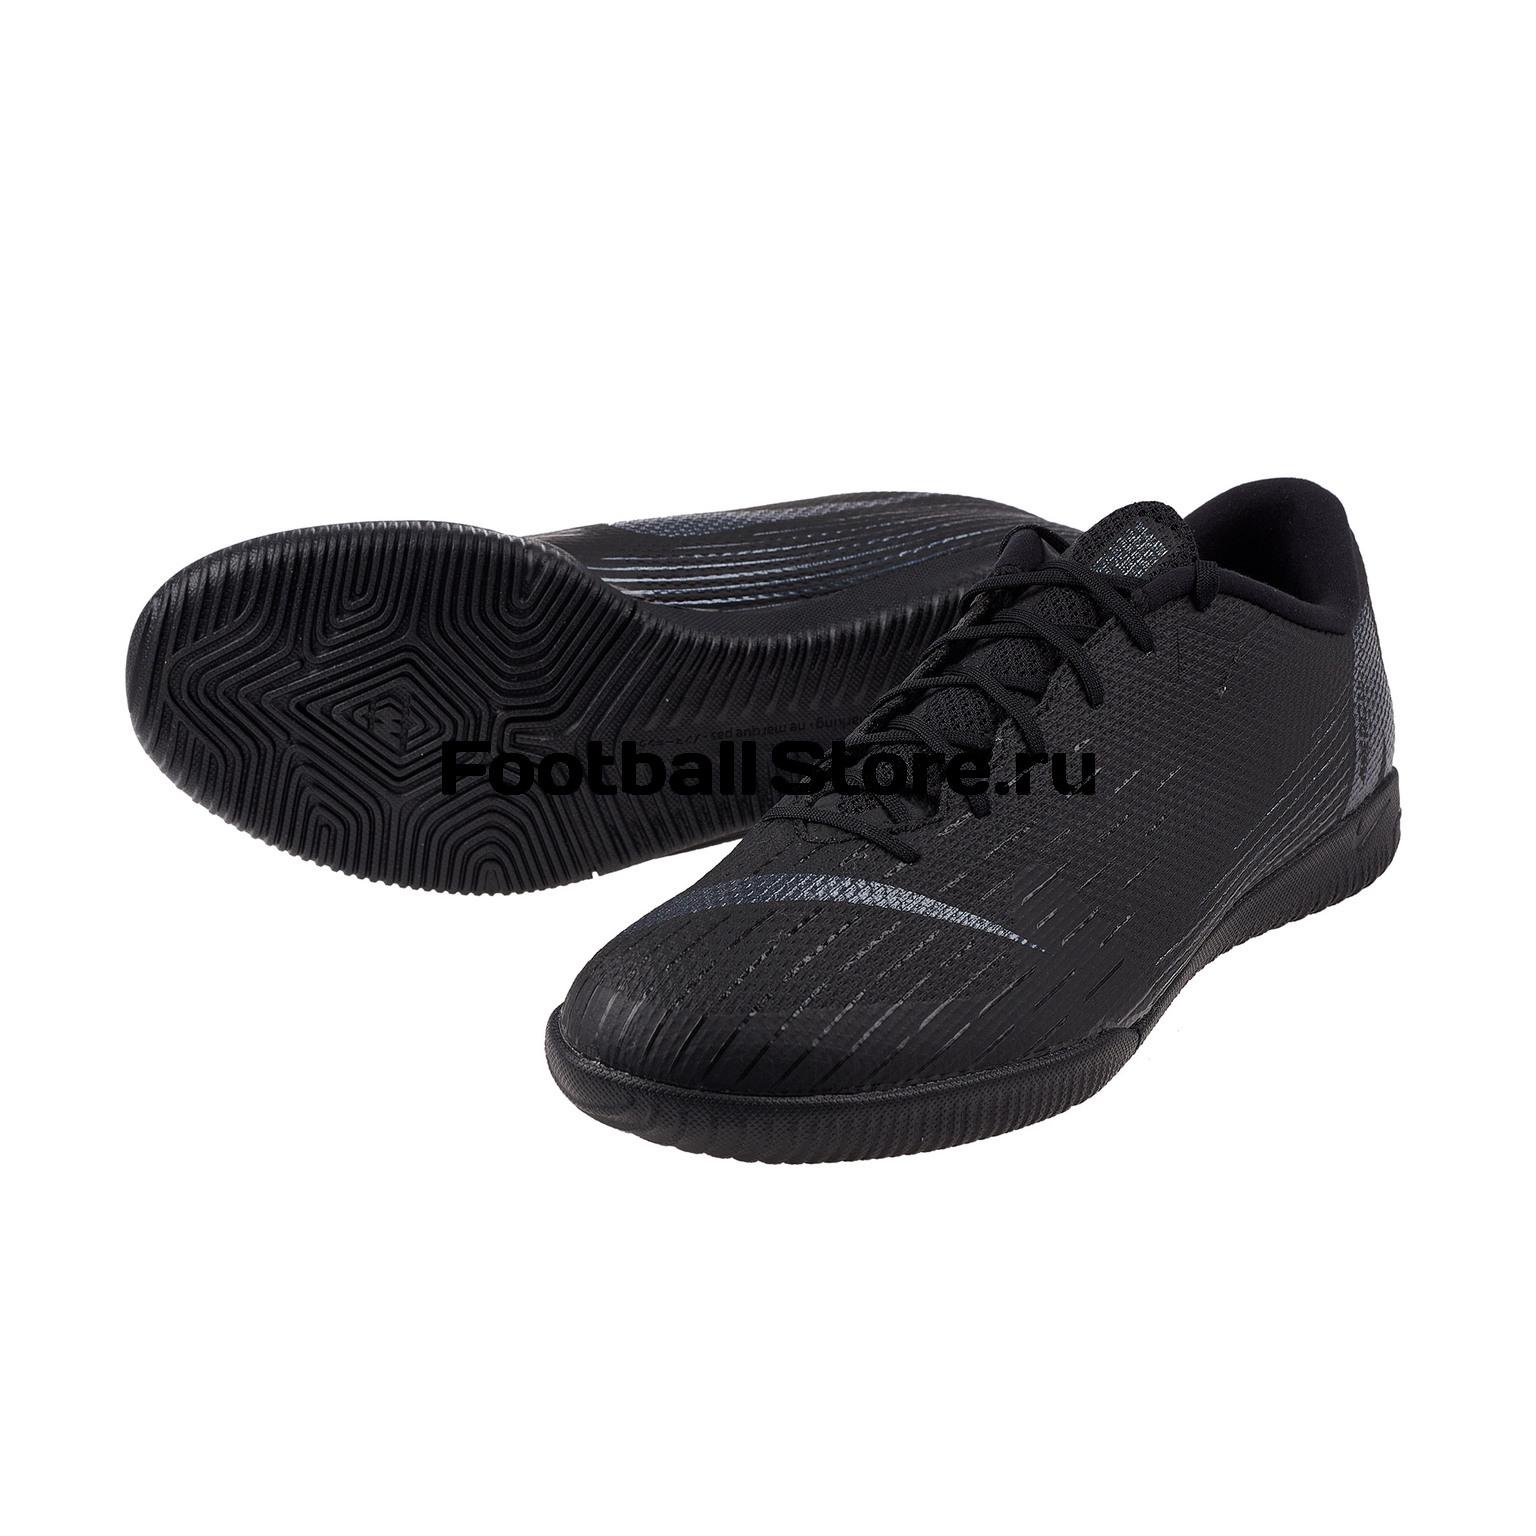 Футзалки Nike VaporX 12 Academy IC AH7383-001